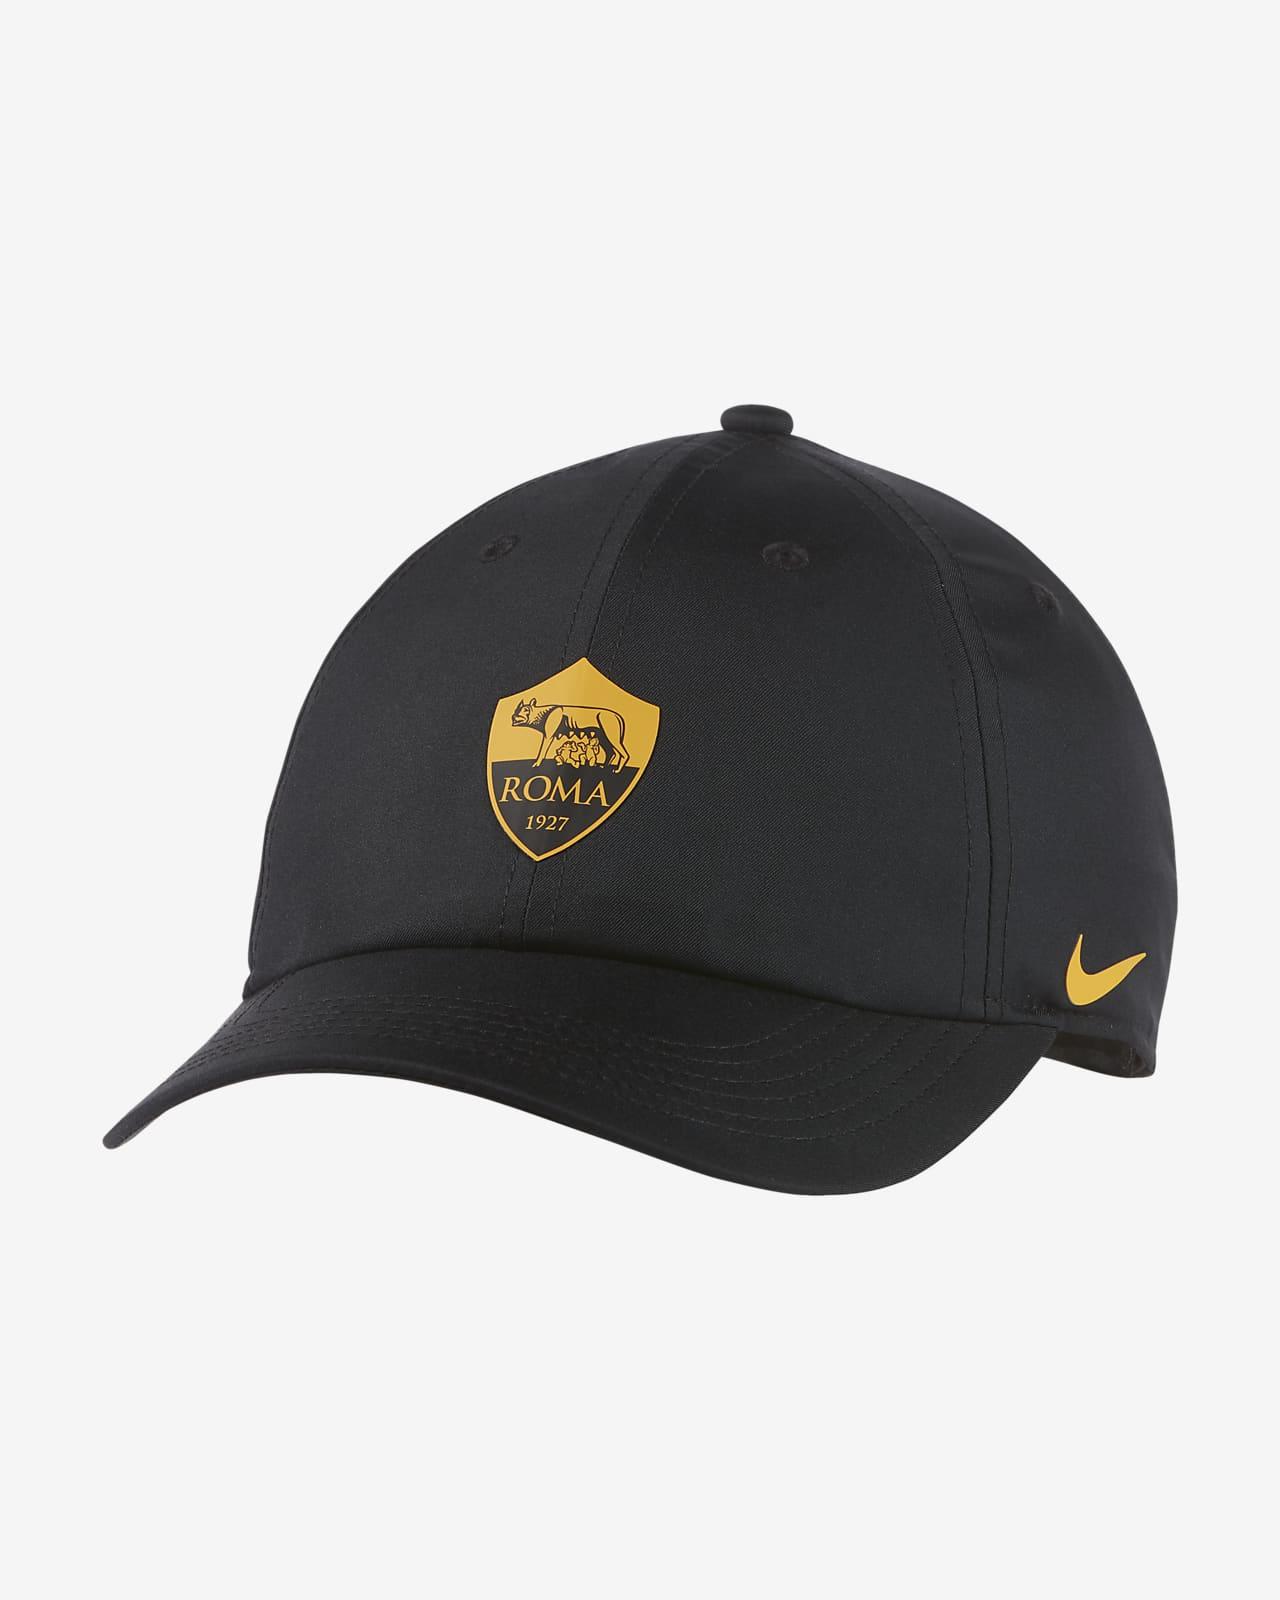 Cappello regolabile Nike Dri-FIT AS Roma Heritage86 - Bambini